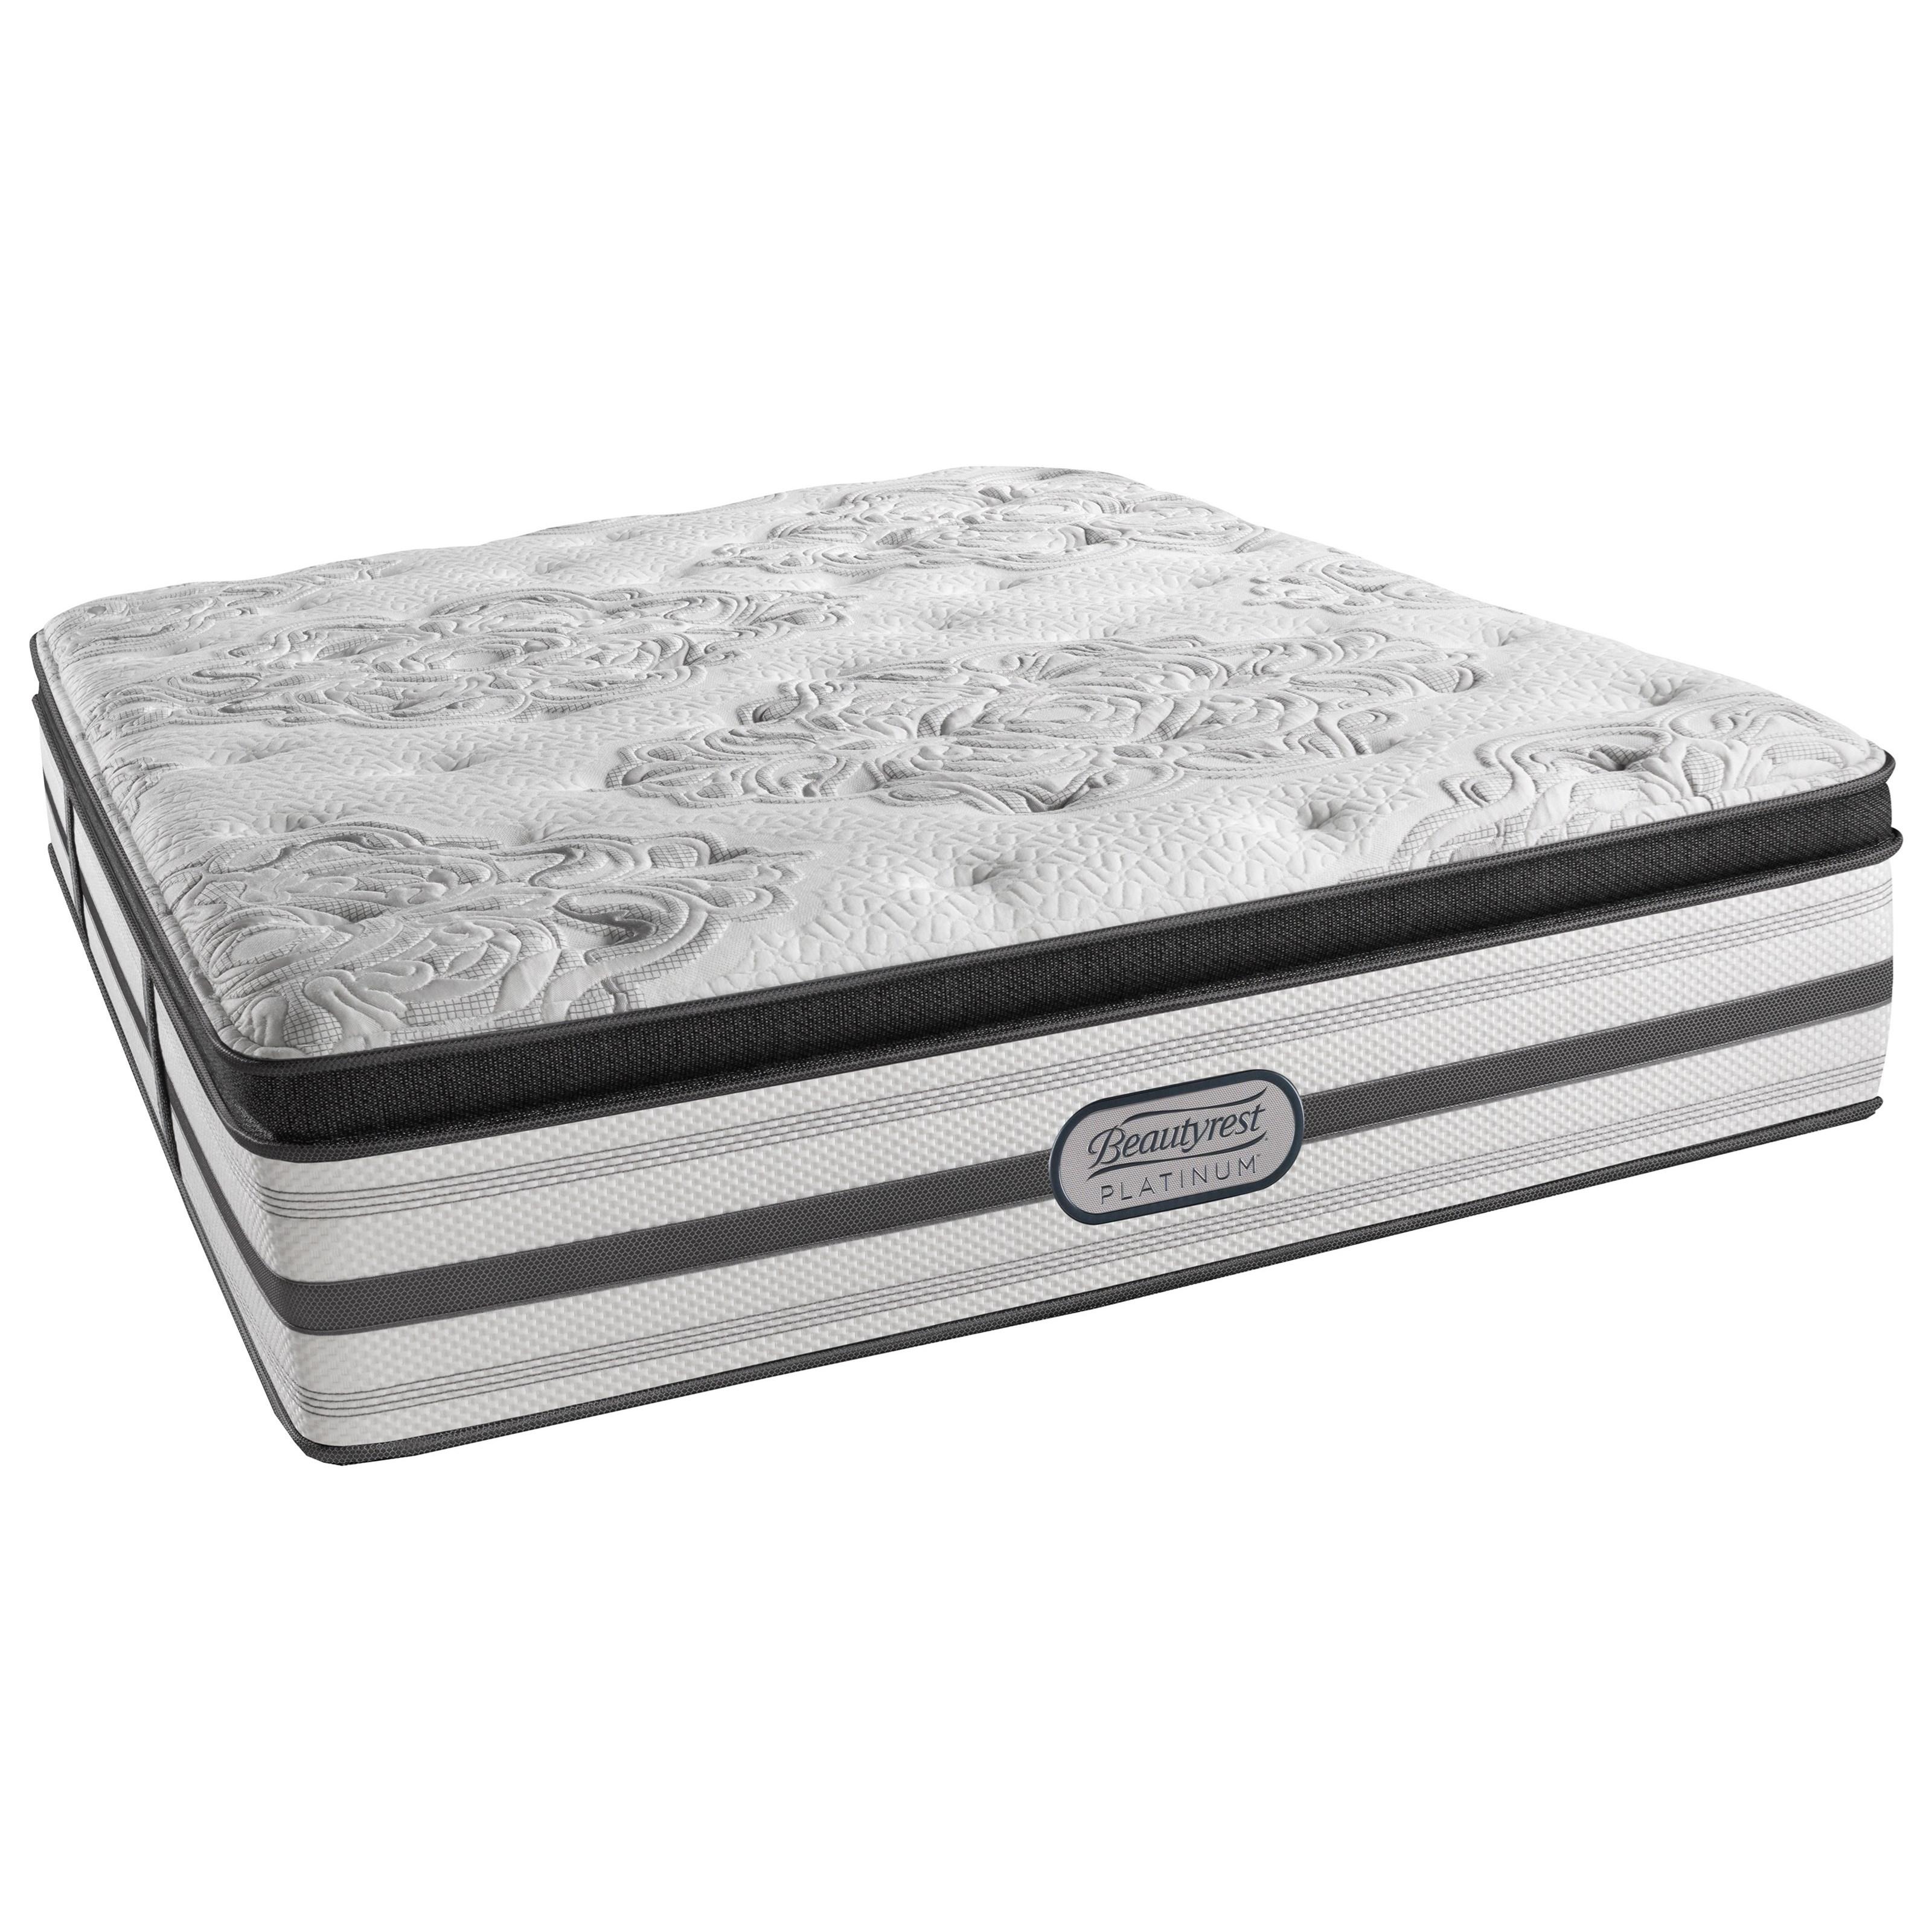 "Beautyrest Platinum Gabriella King Luxury Firm PT 15"" Mattress - Item Number: LV3LFPT-K"